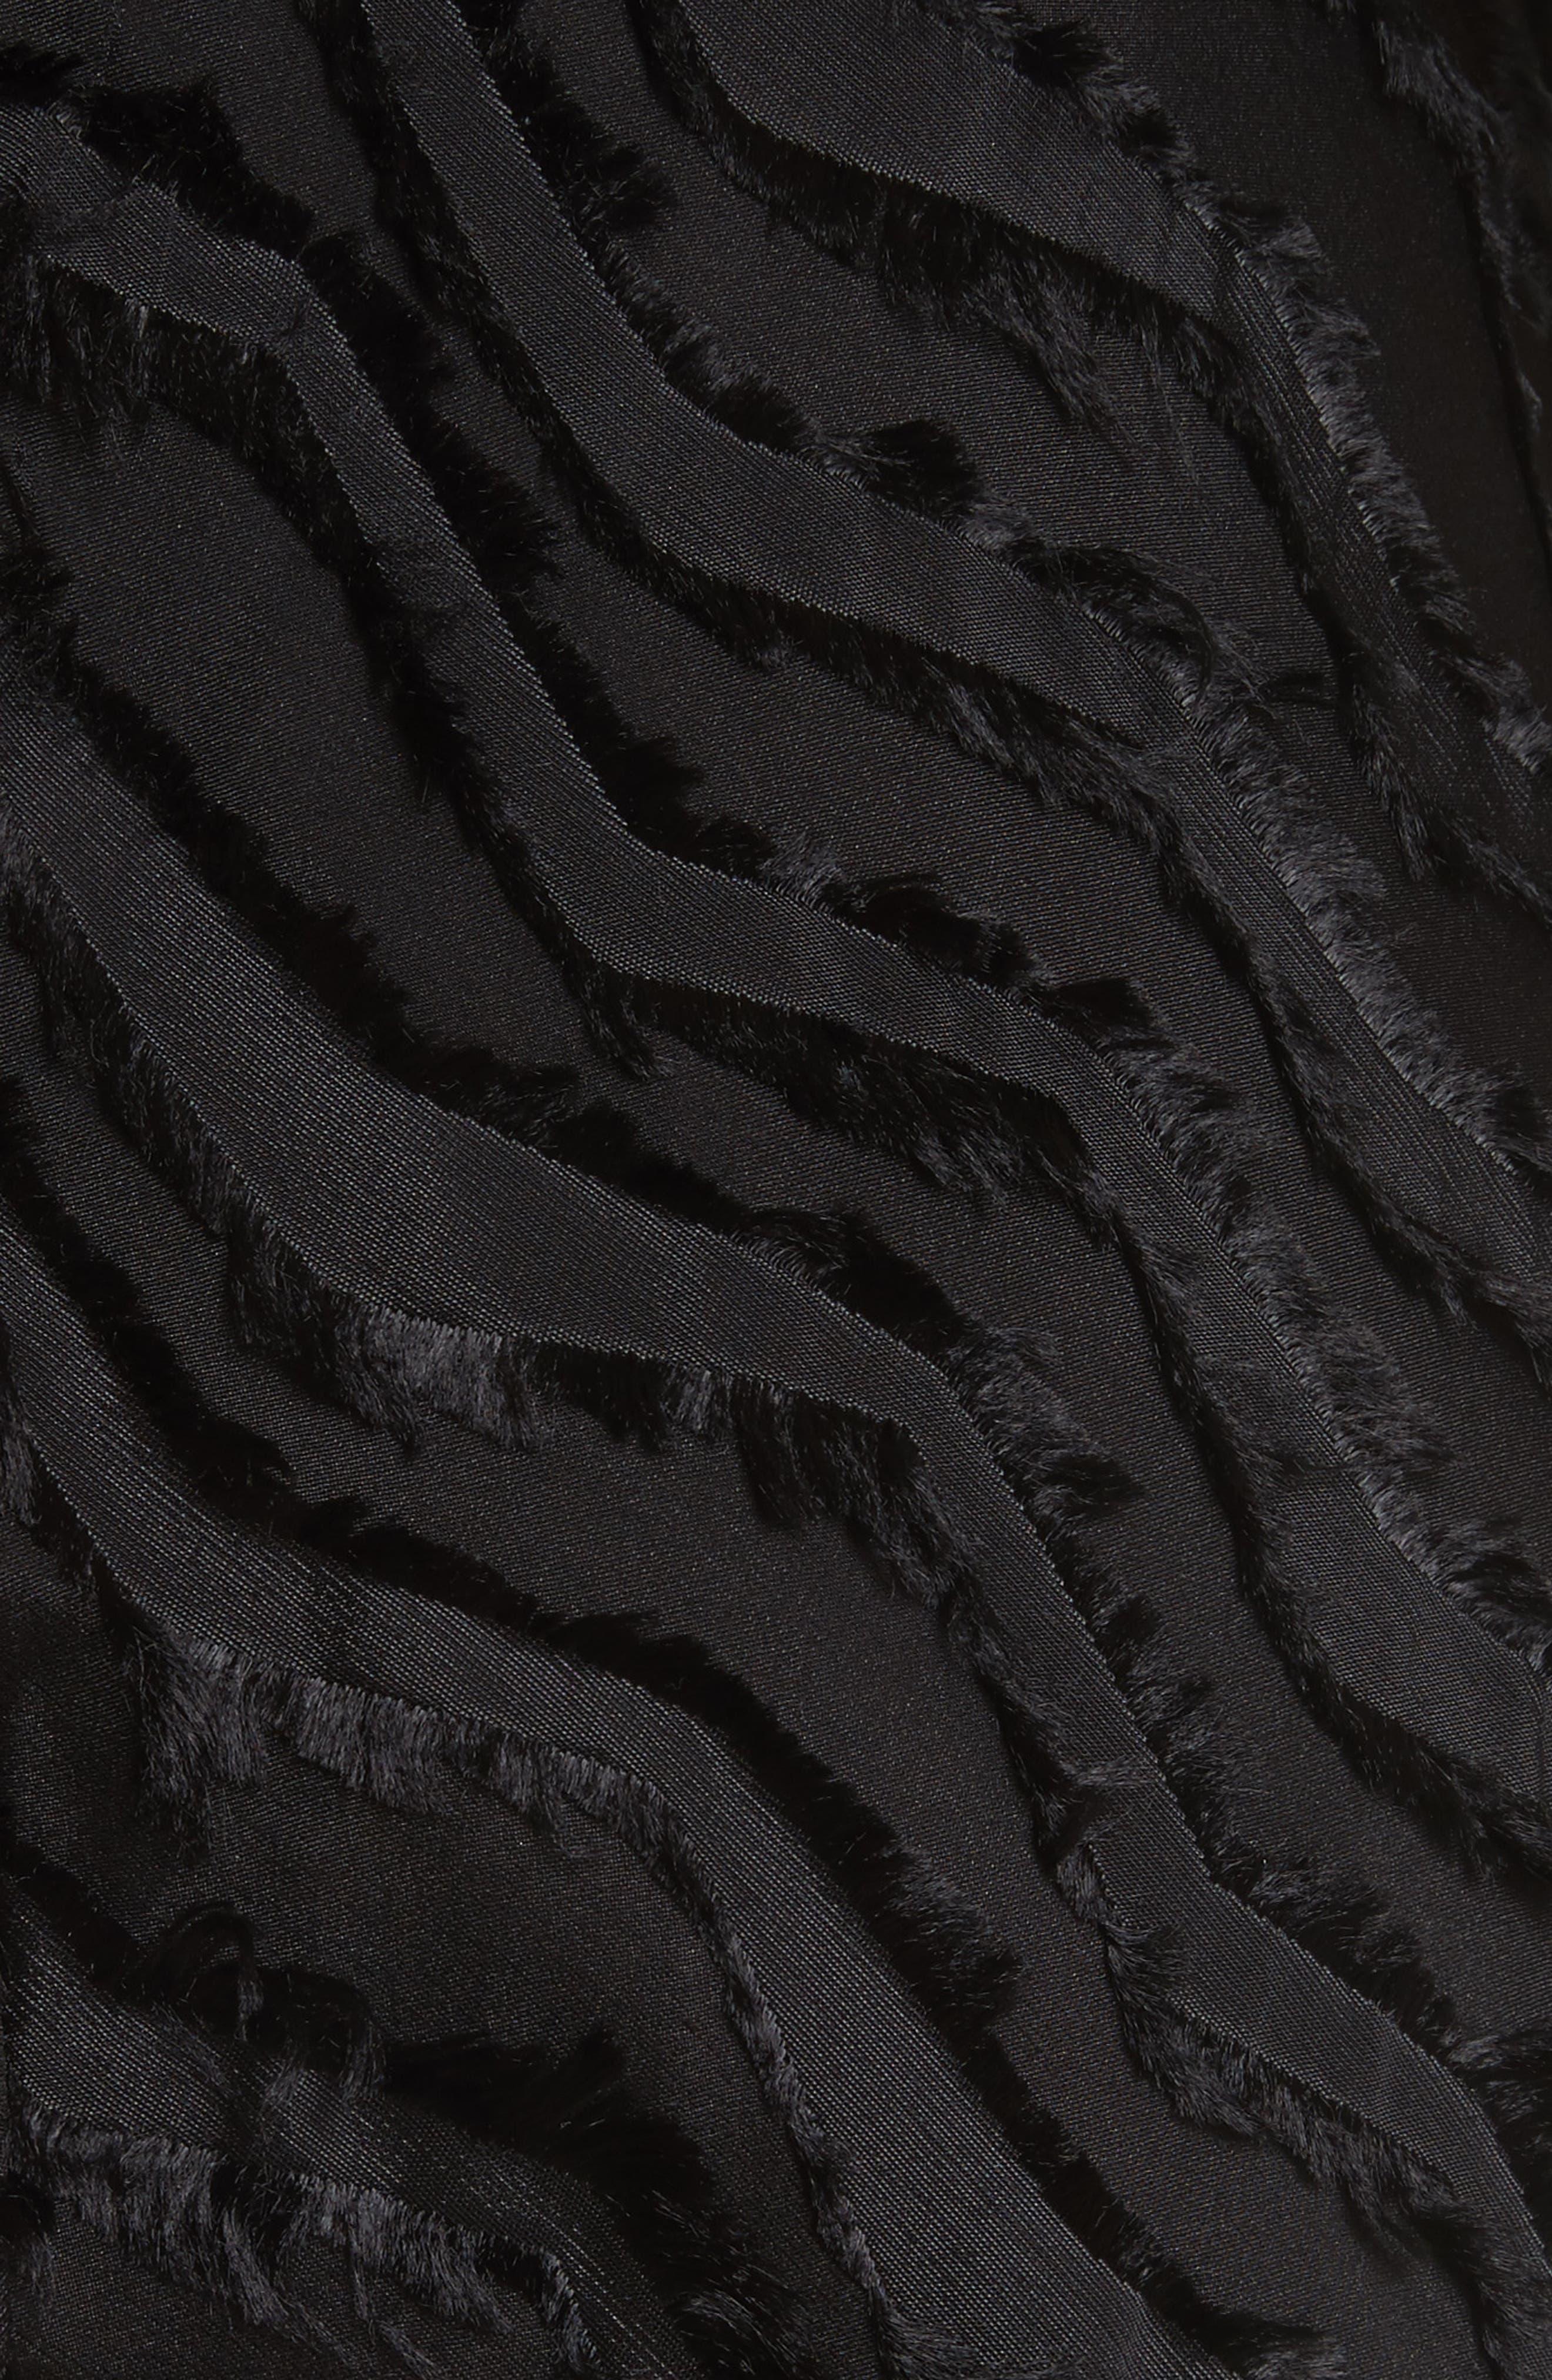 Chevron Fringe Fil Coupé Dress,                             Alternate thumbnail 6, color,                             Black